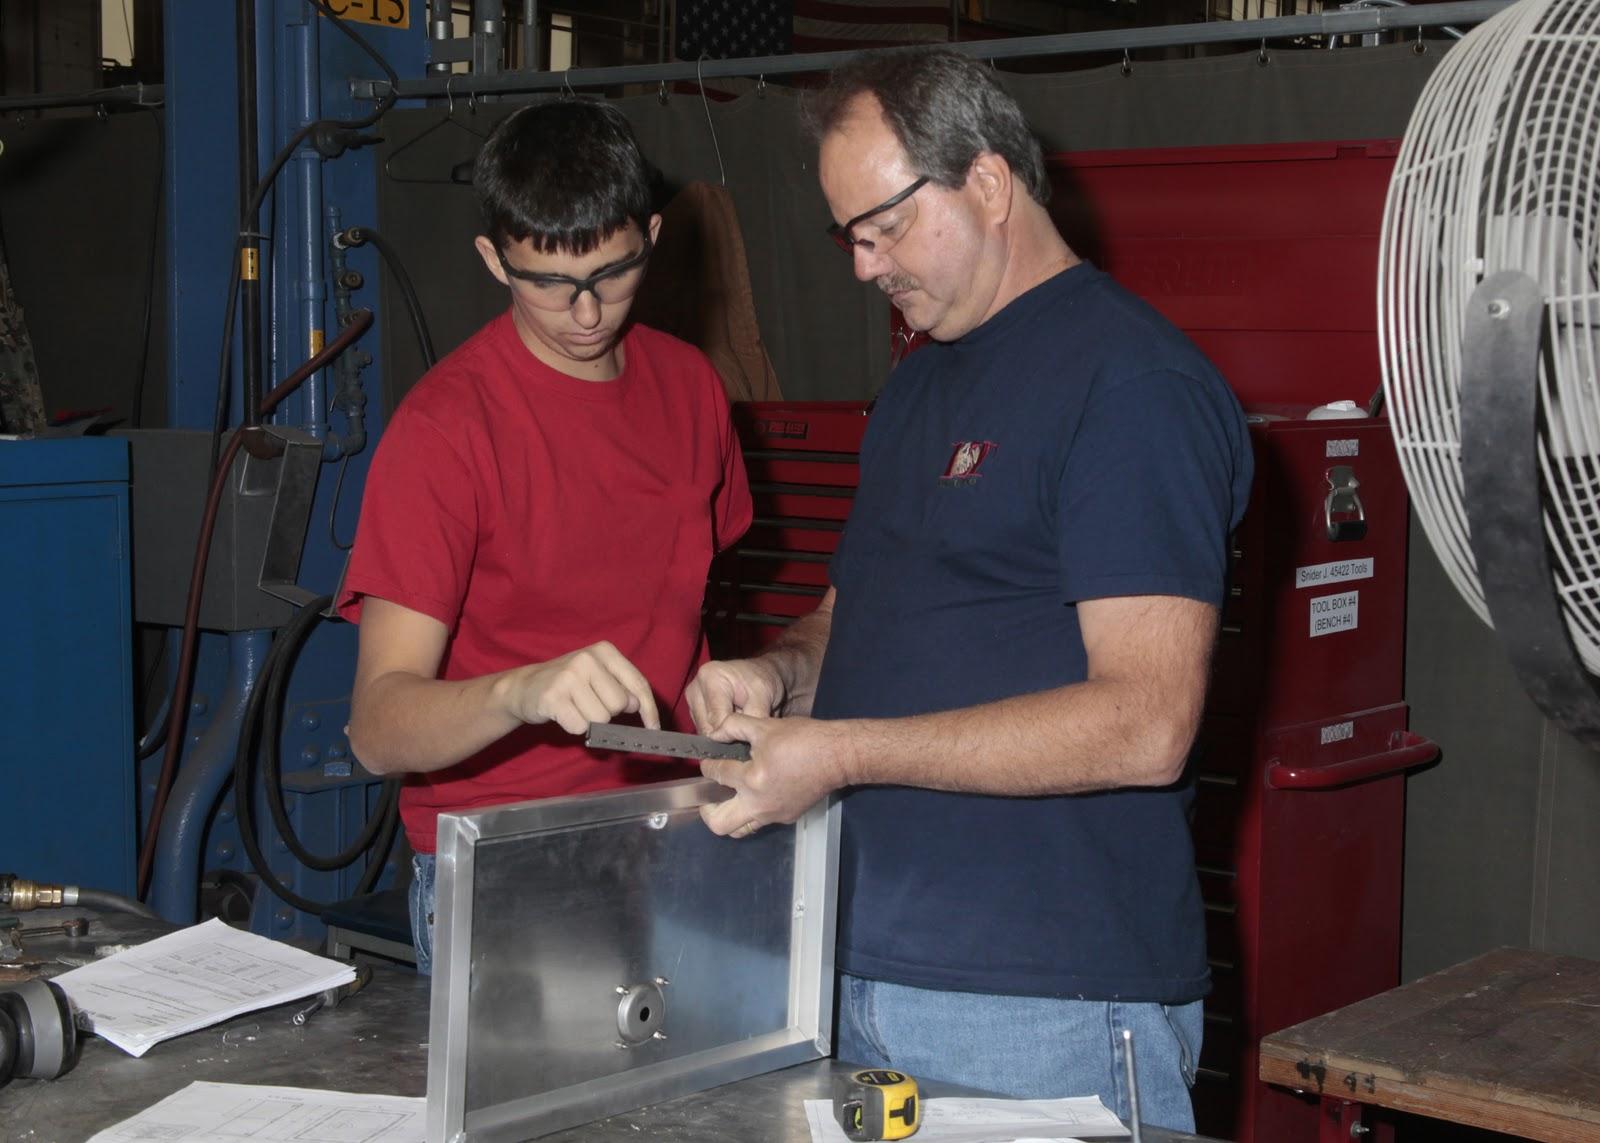 NNSY Careers: Apprentice Program